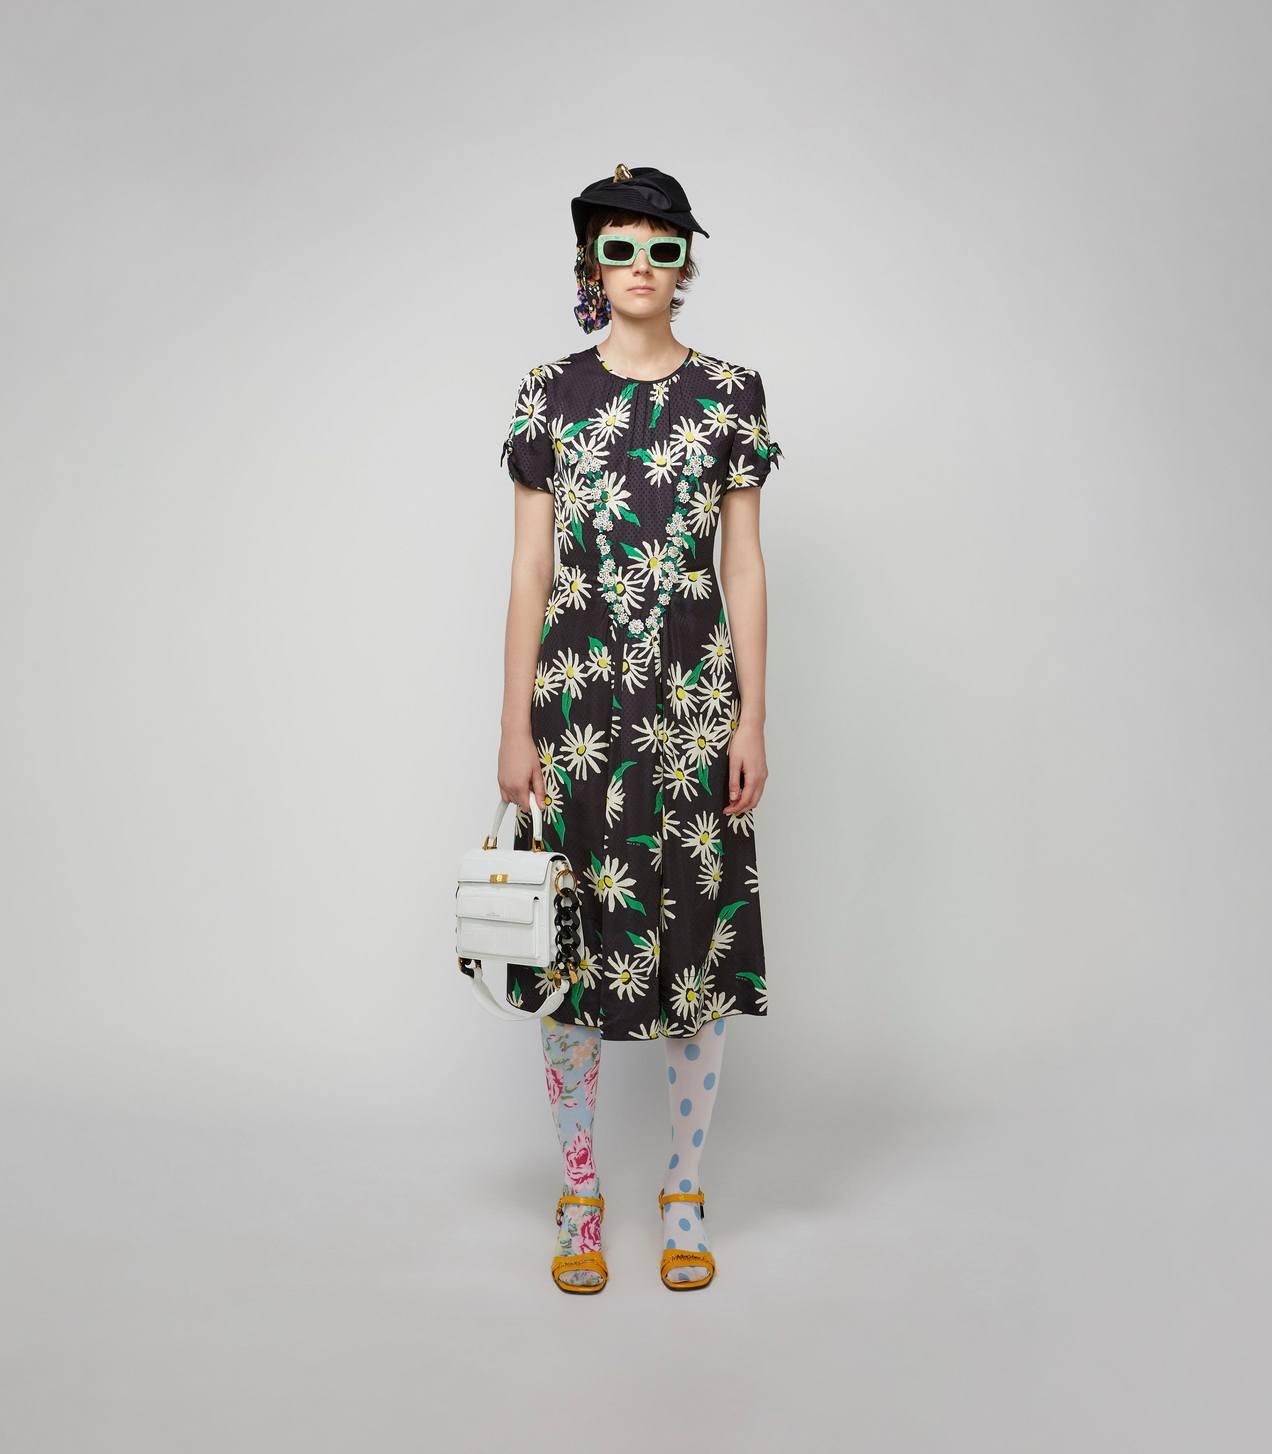 Sofia Loves The 40s Dress